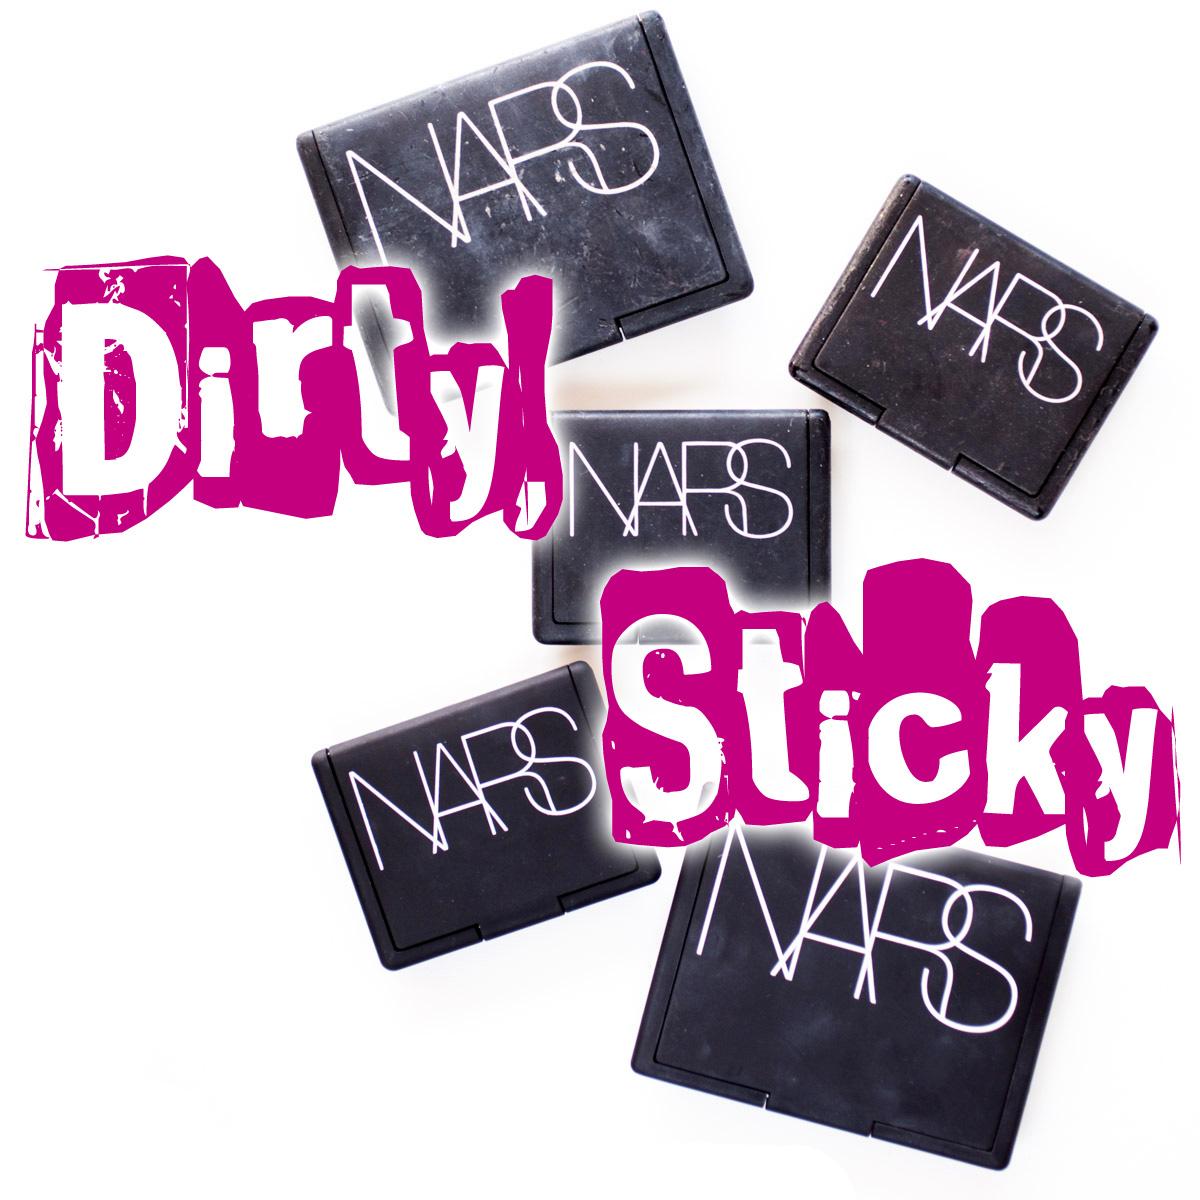 NARS Sticky Packaging klebrige Verpackung